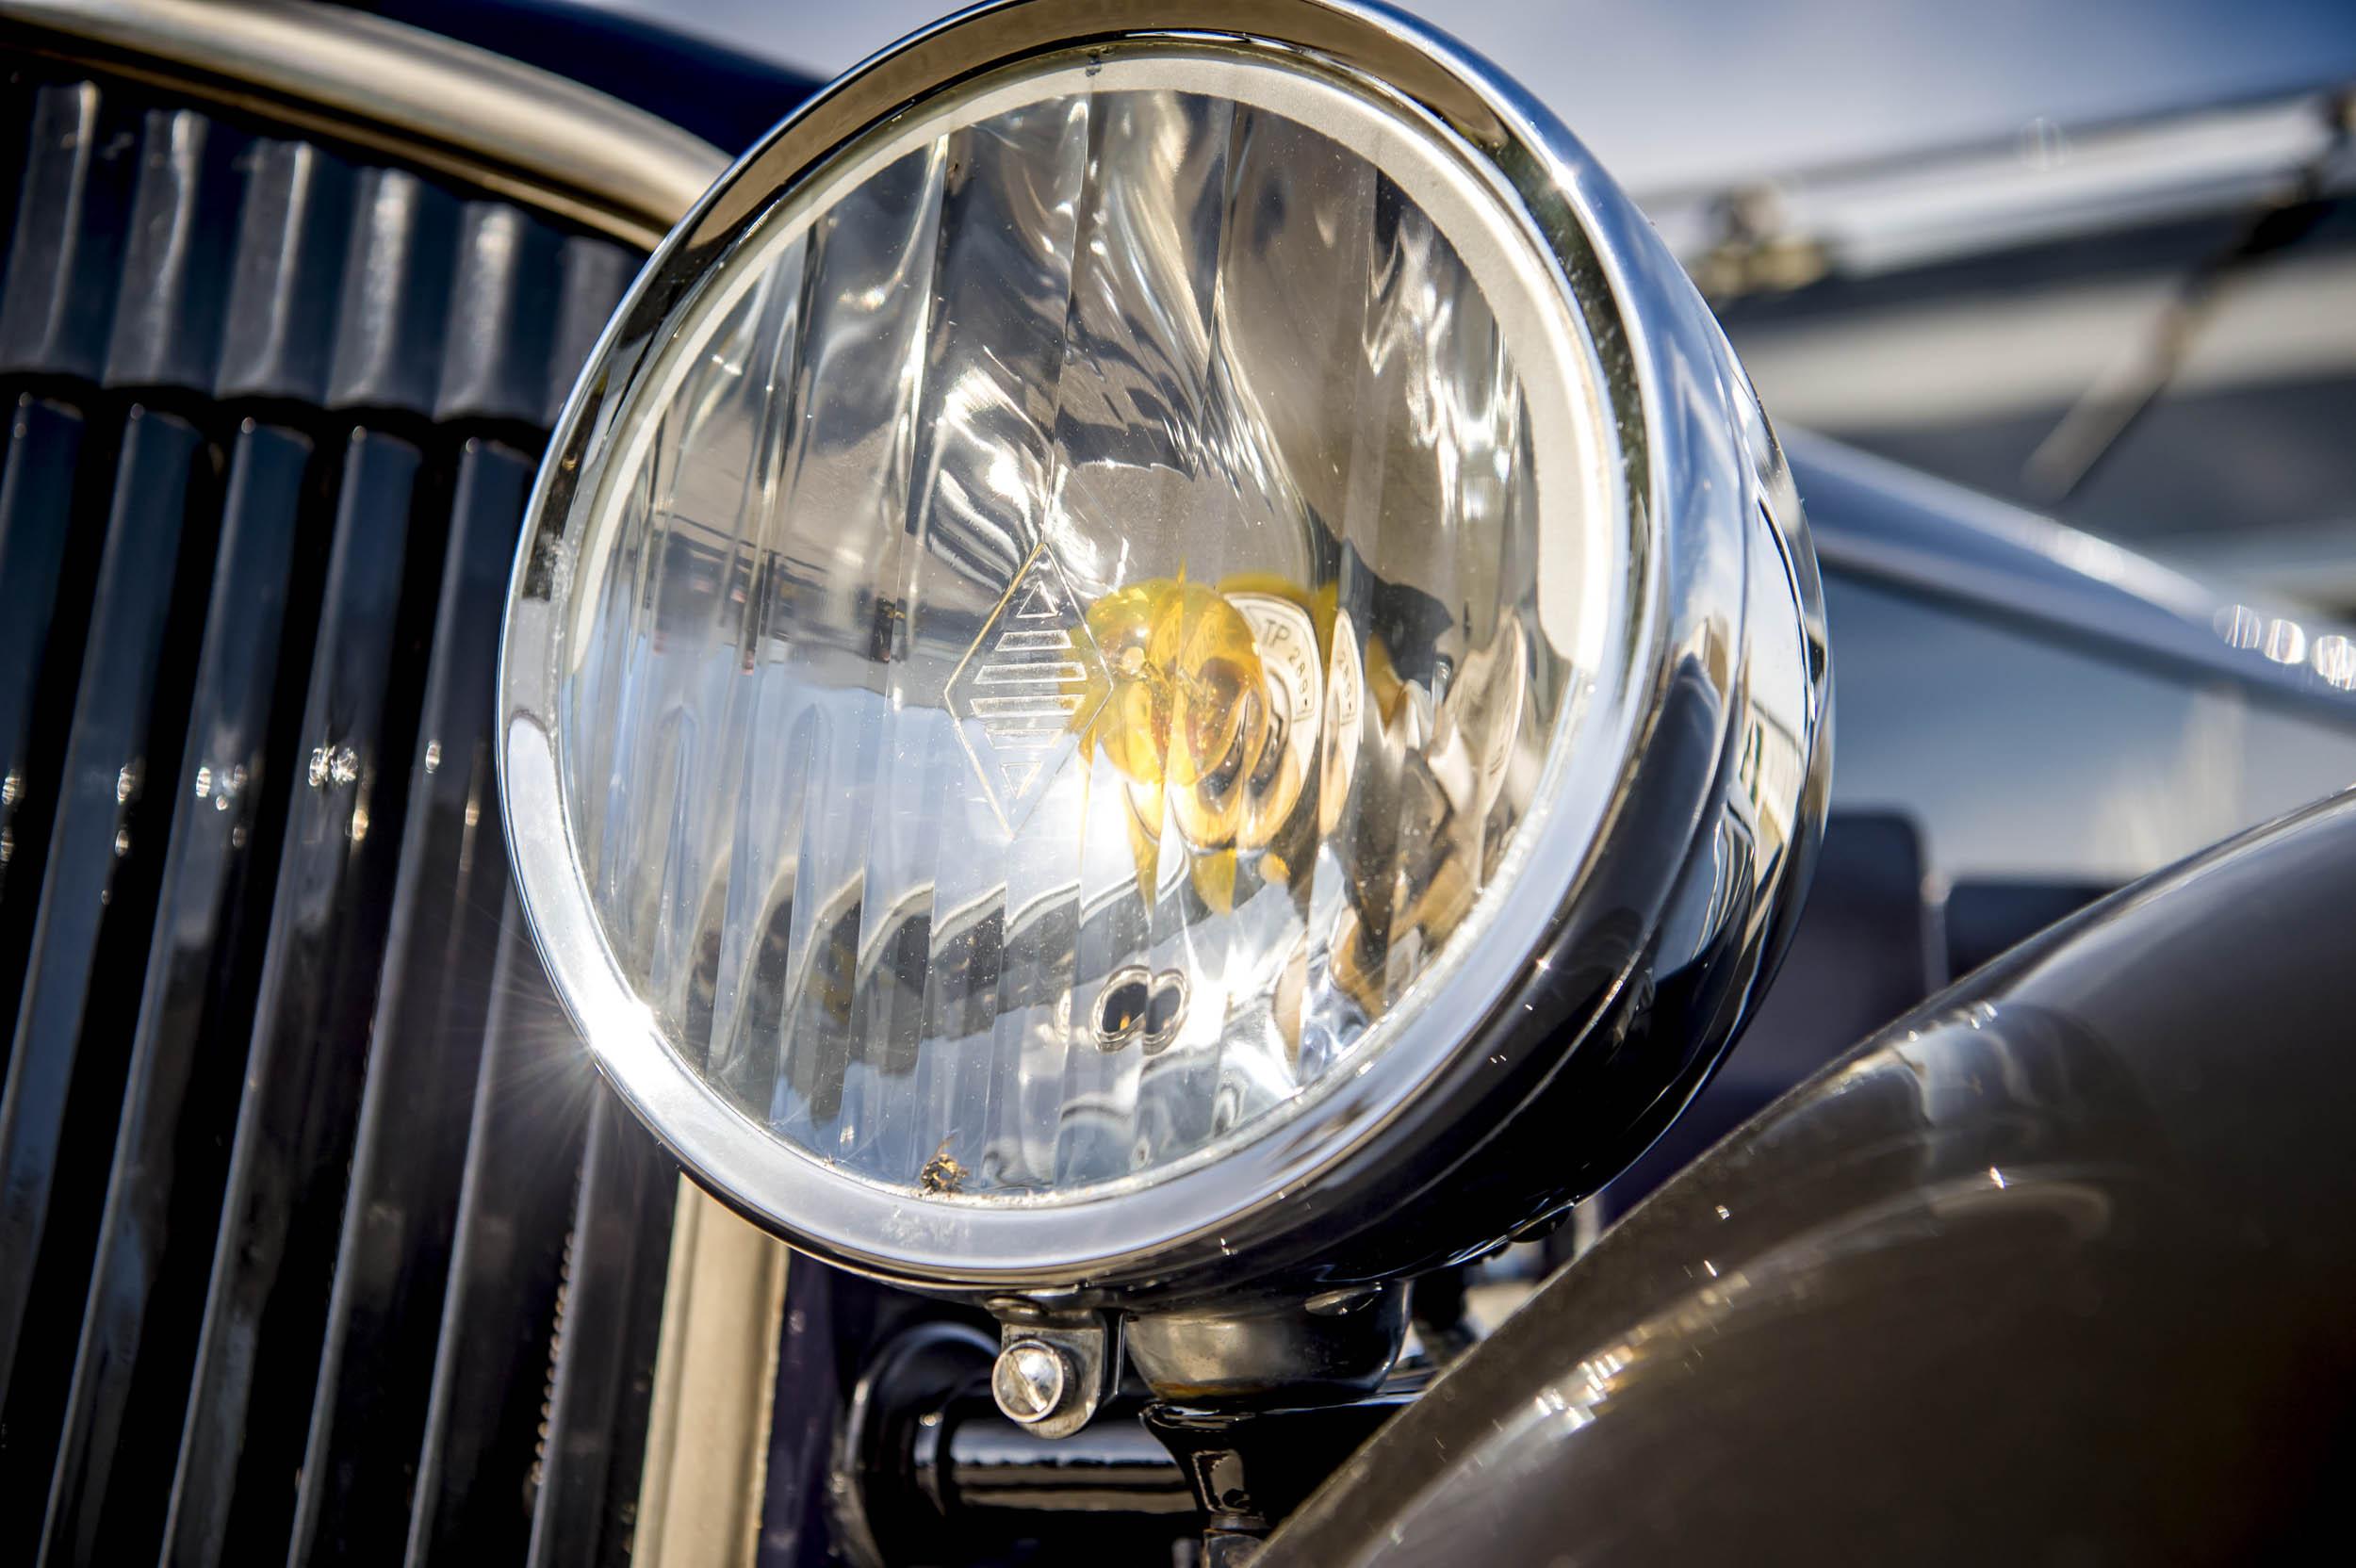 1929 renault nervastella coupe de ville headlight